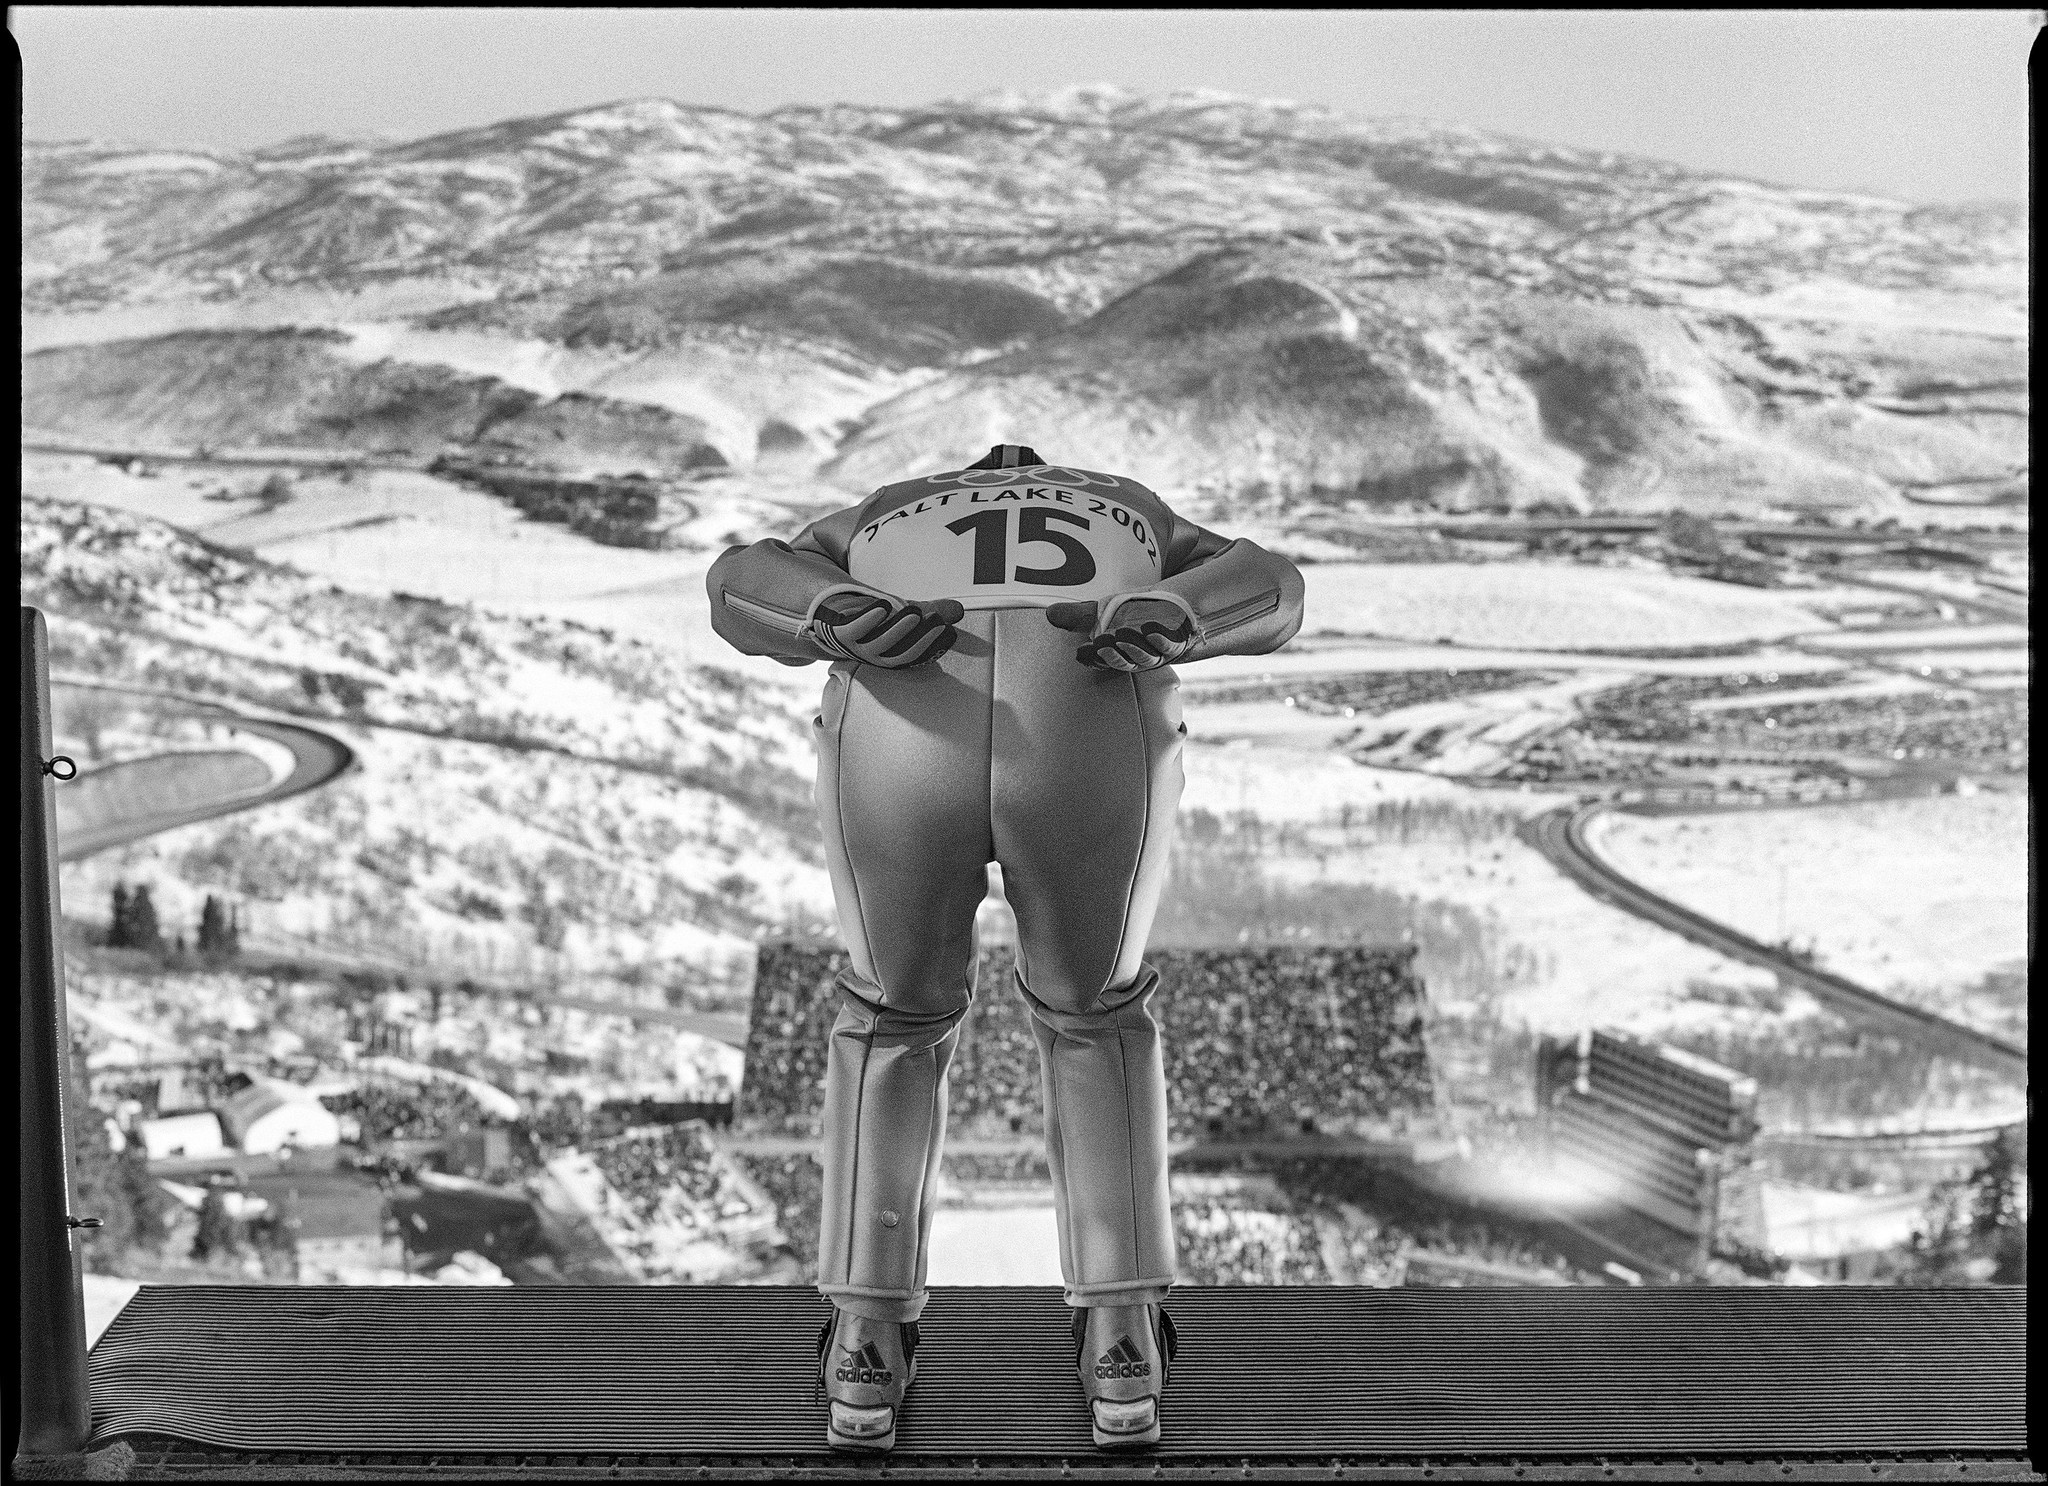 An Olympics ski jumper preparing to take off in Park City, Utah, in 2002.